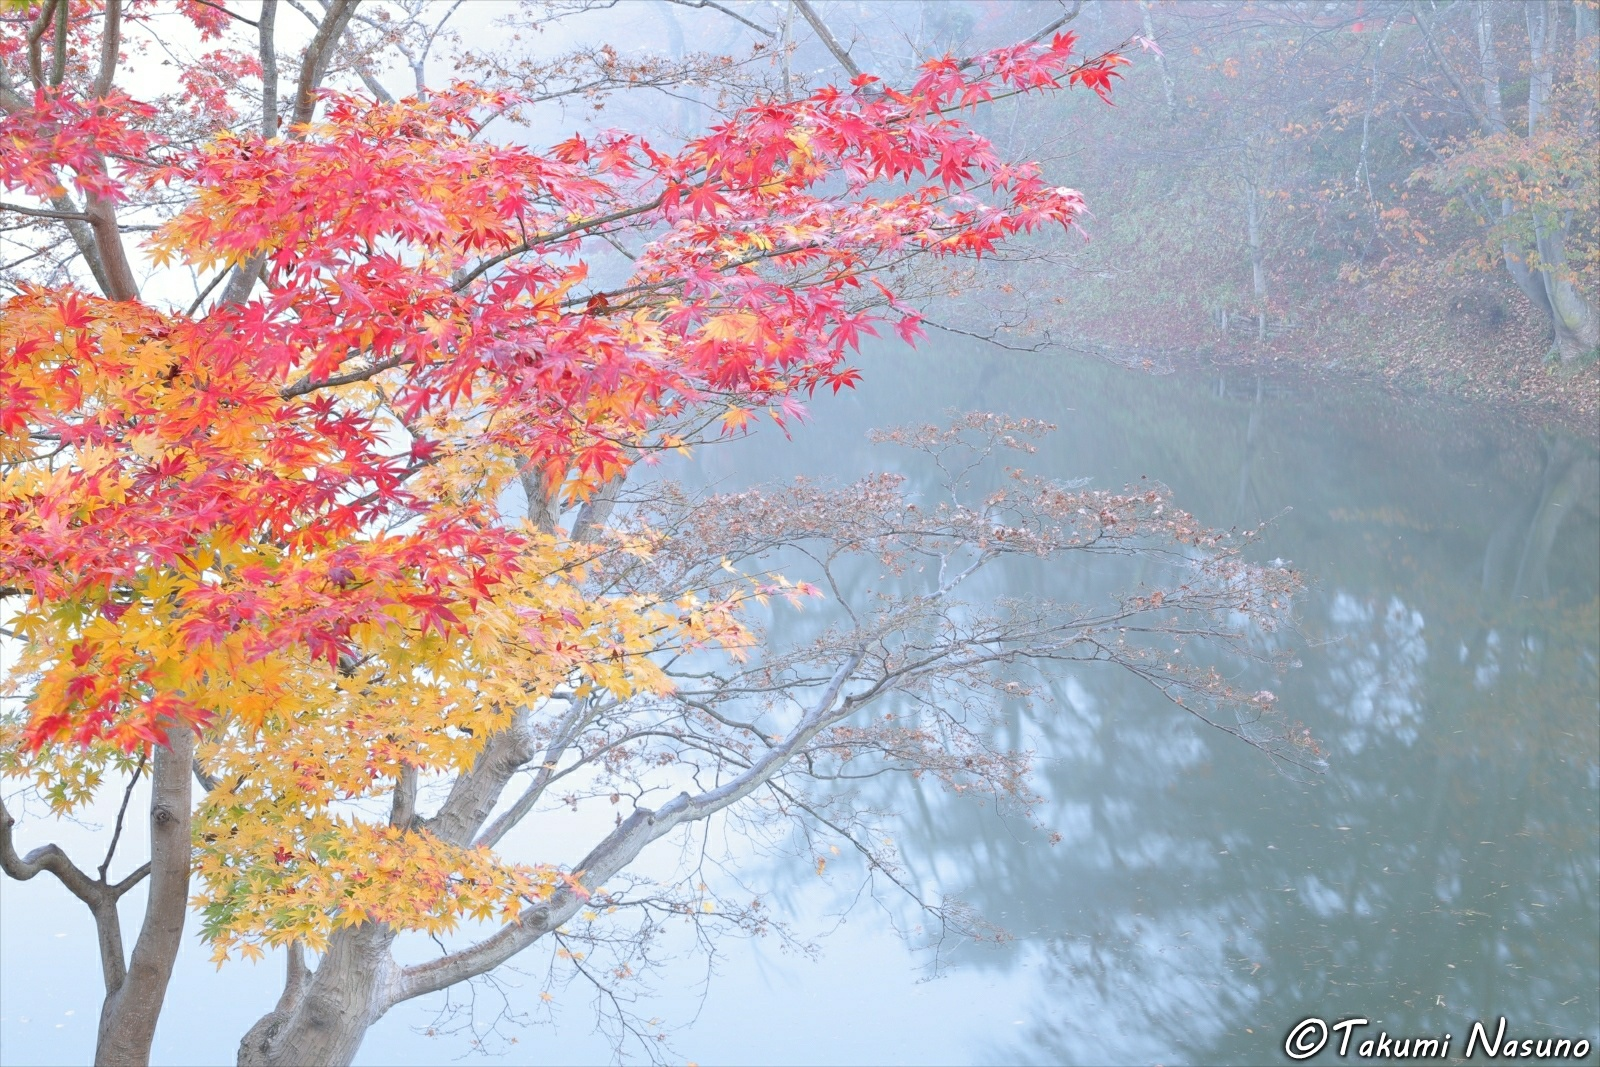 Autumn Colors around the Site of Tanagura Castle